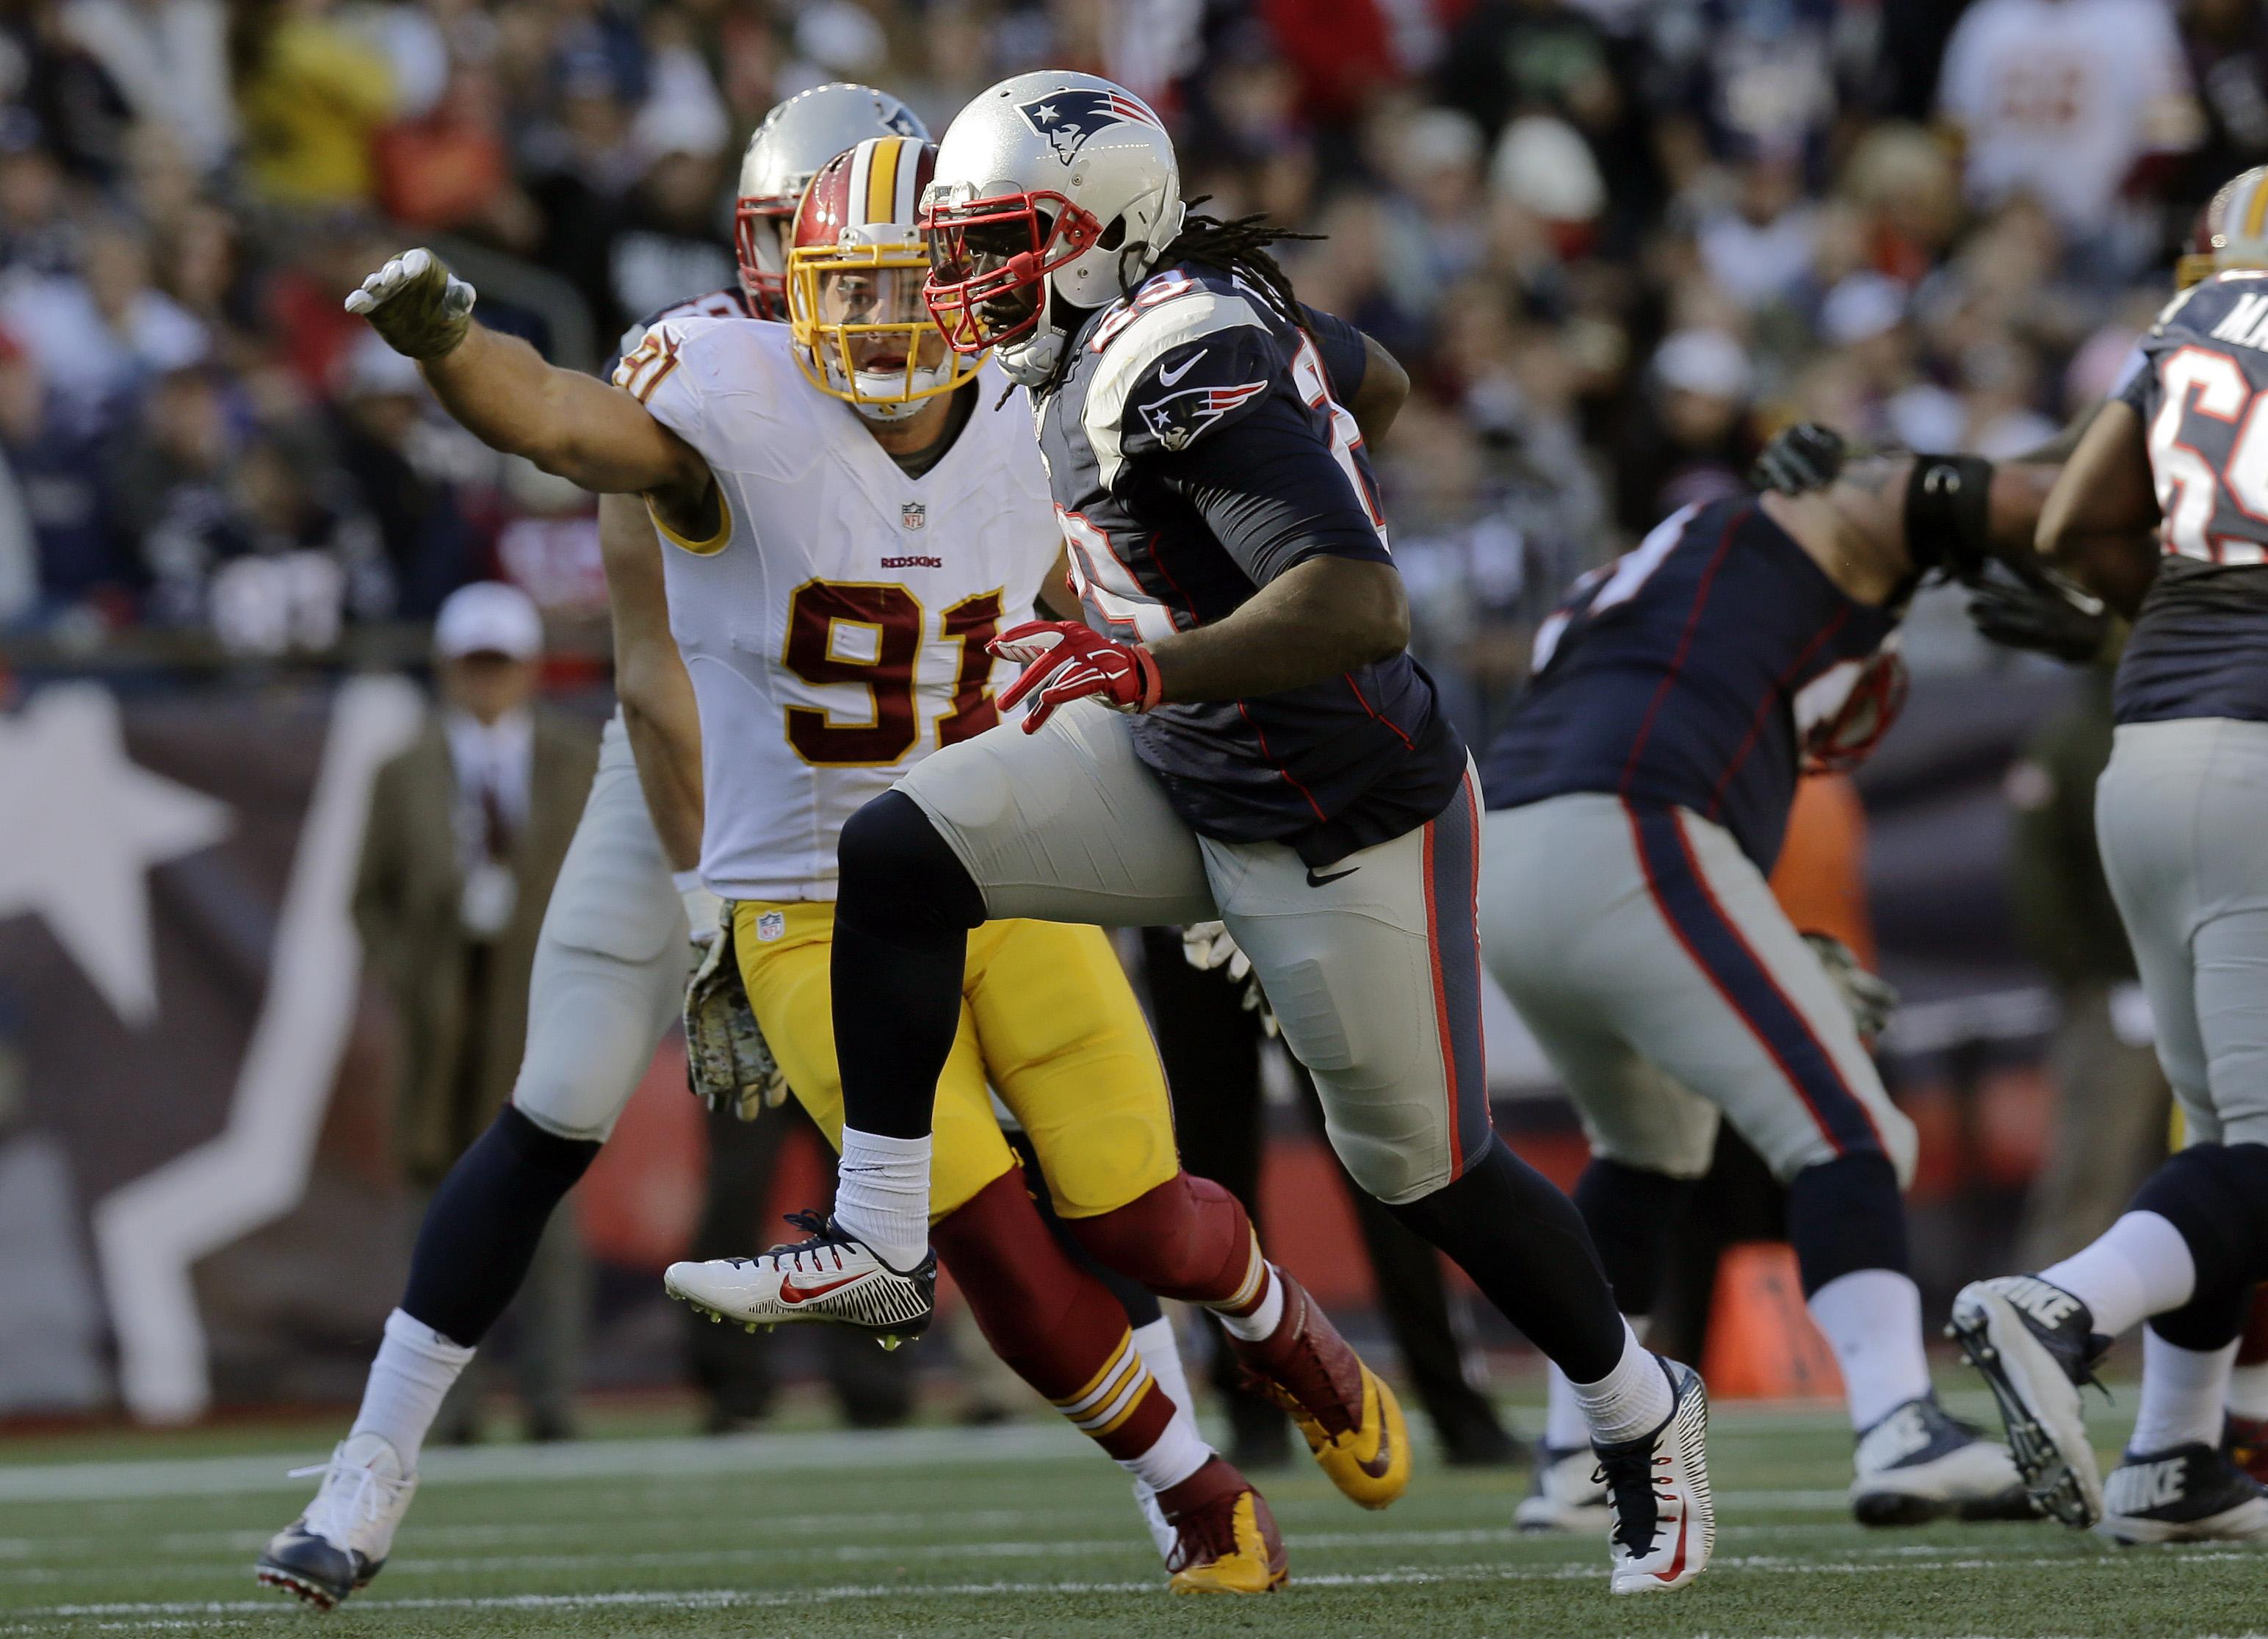 New England Patriots running back LeGarrette Blount (29) runs away from Washington Redskins linebacker Ryan Kerrigan (91) during the first half of an NFL football game, Sunday, Nov. 8, 2015, in Foxborough, Mass. (AP Photo/Charles Krupa)